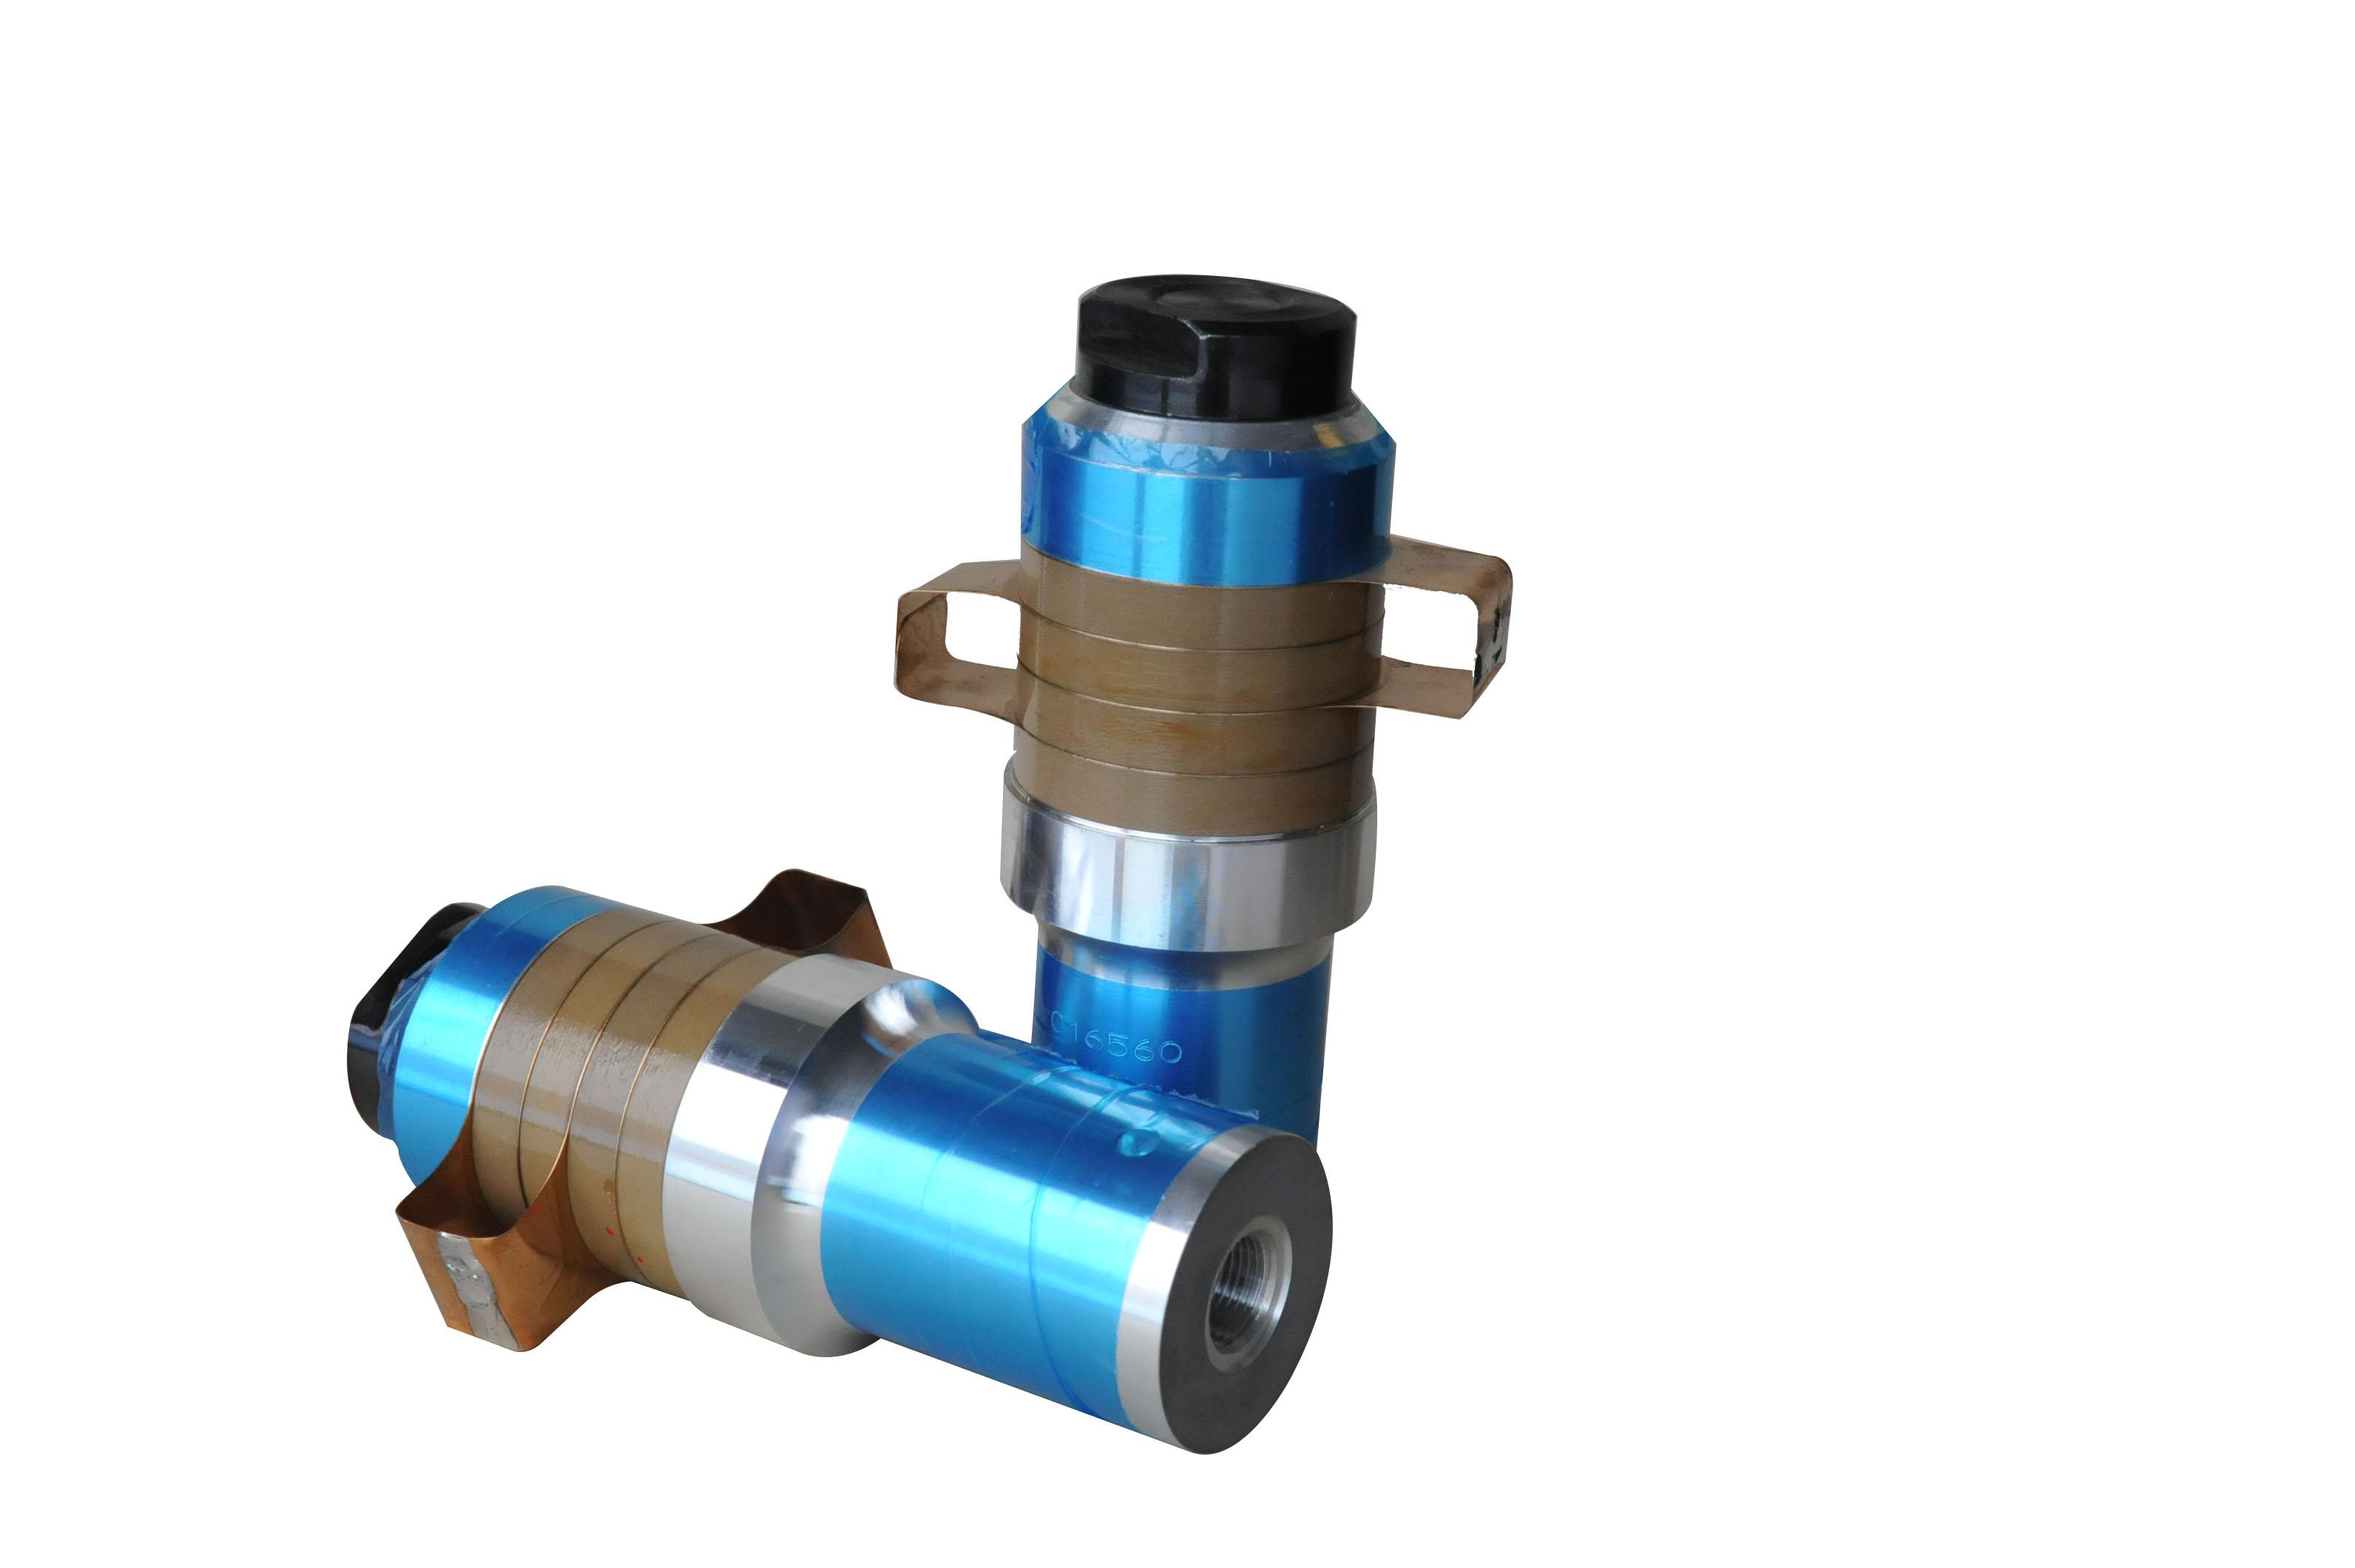 Ultrasonic Plastic Welding Equipmentultrasonic Spot Transducerultrasonic Humidifier Piezoelectric Transducertransducer High Reliability